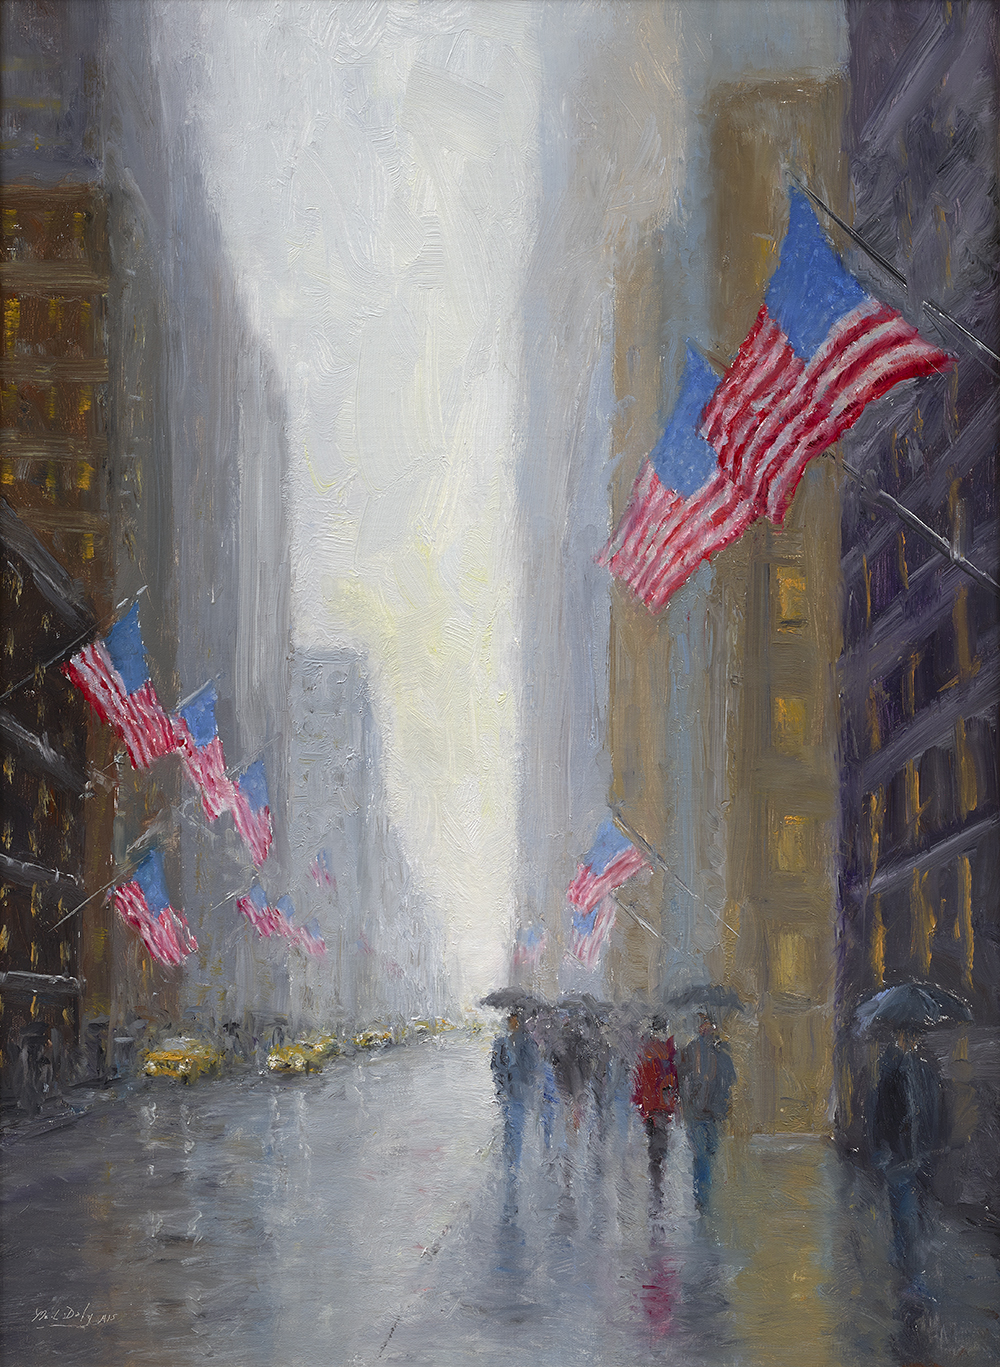 mark_daly_md1059_rainy_day_flags_new_york_city.jpg